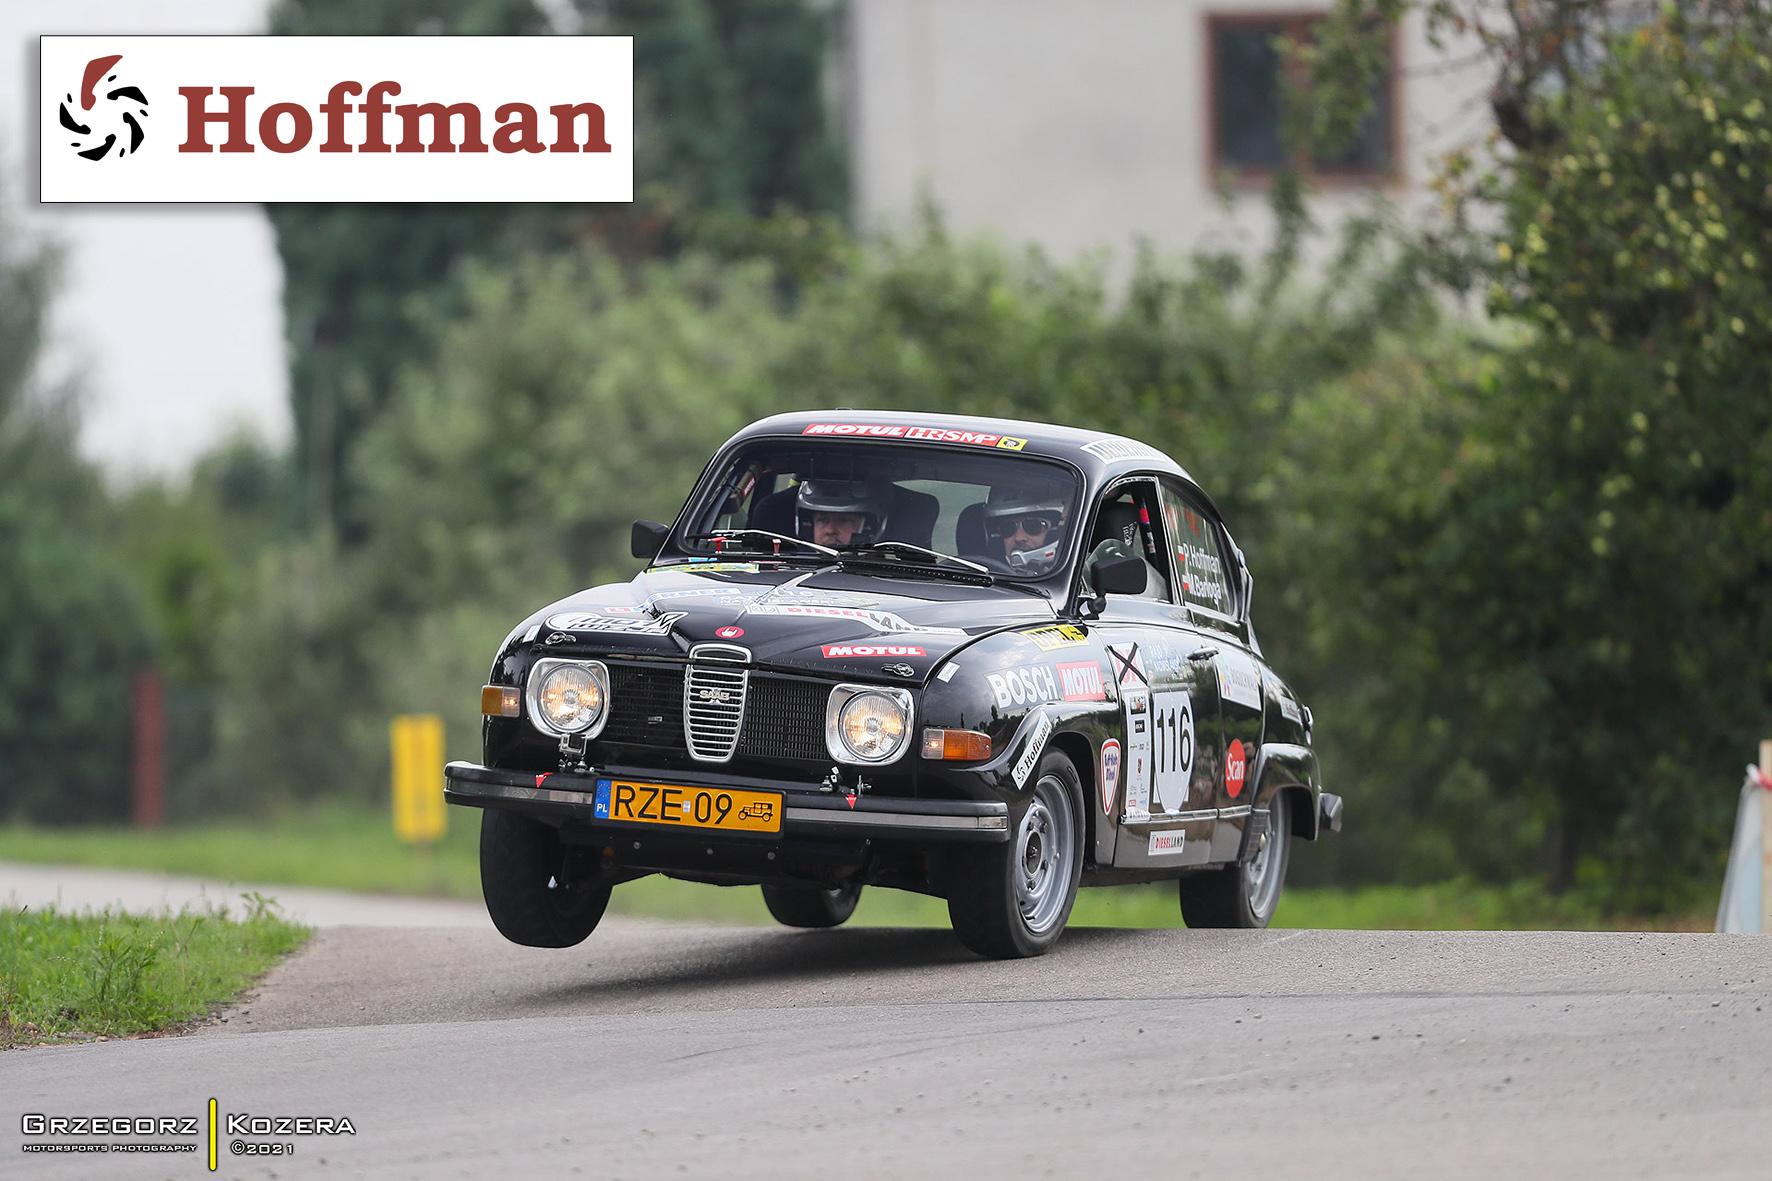 Saab 96 Hoffman Auto